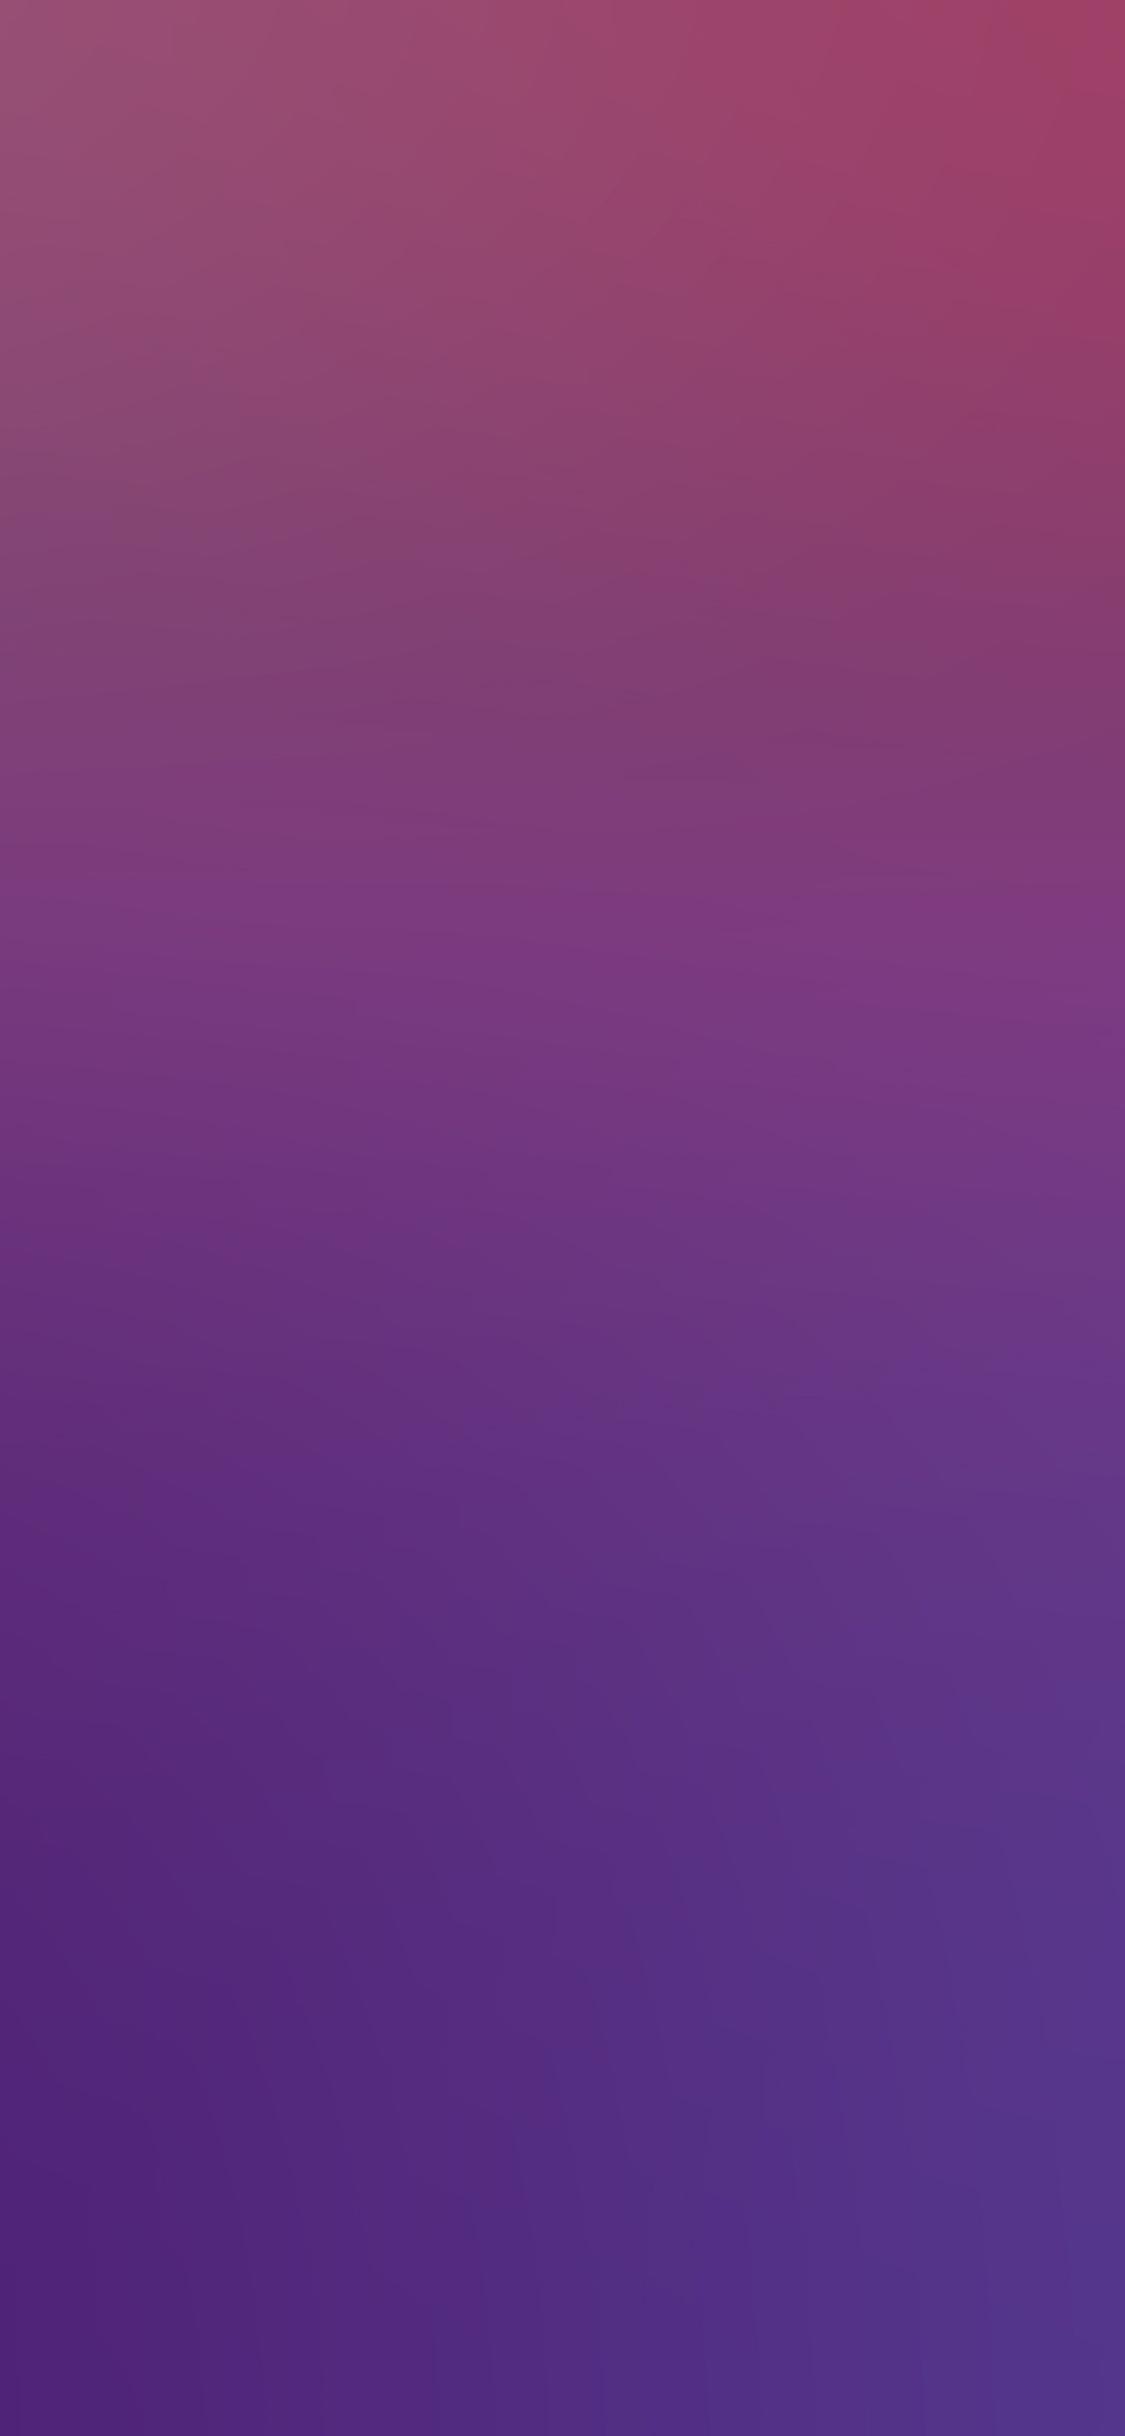 iPhoneXpapers.com-Apple-iPhone-wallpaper-sc54-wonderful-tonight-in-toronto-blur